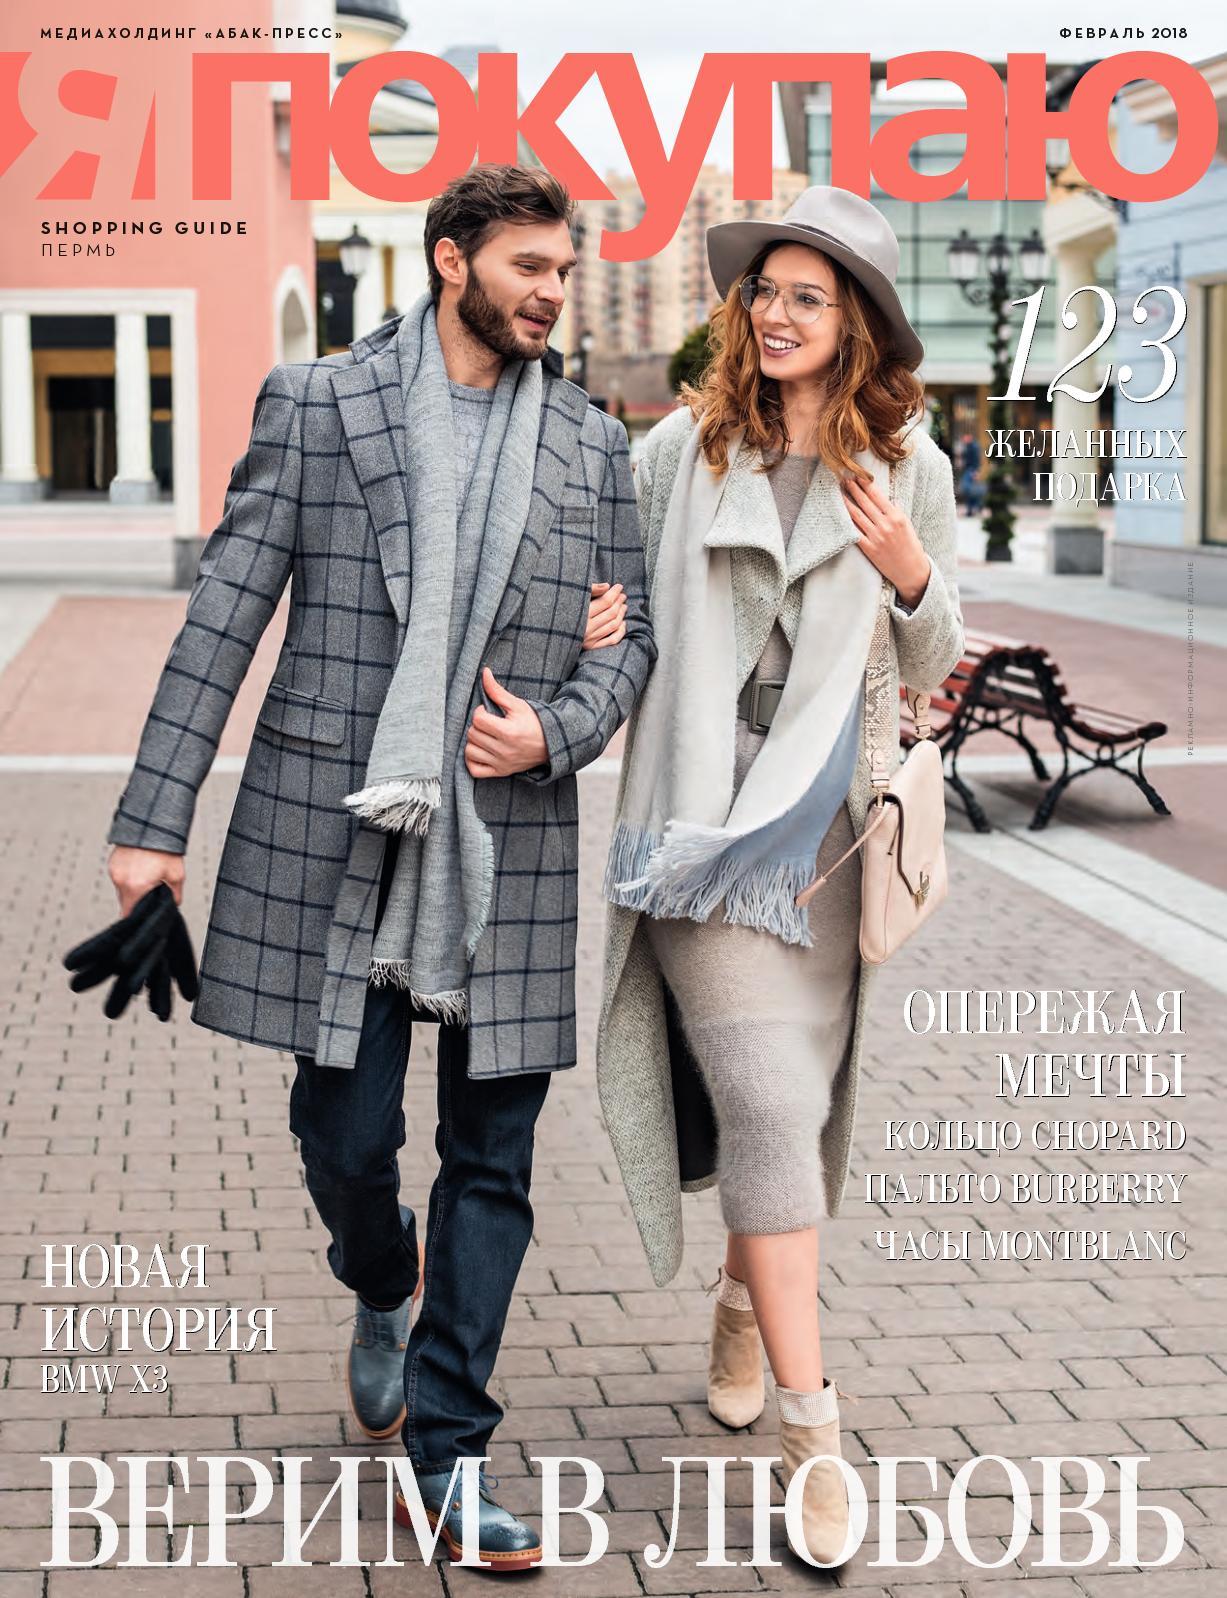 d91b5730b3c0ba9 Calaméo - Shopping Guide «Я Покупаю. Пермь», февраль 2018